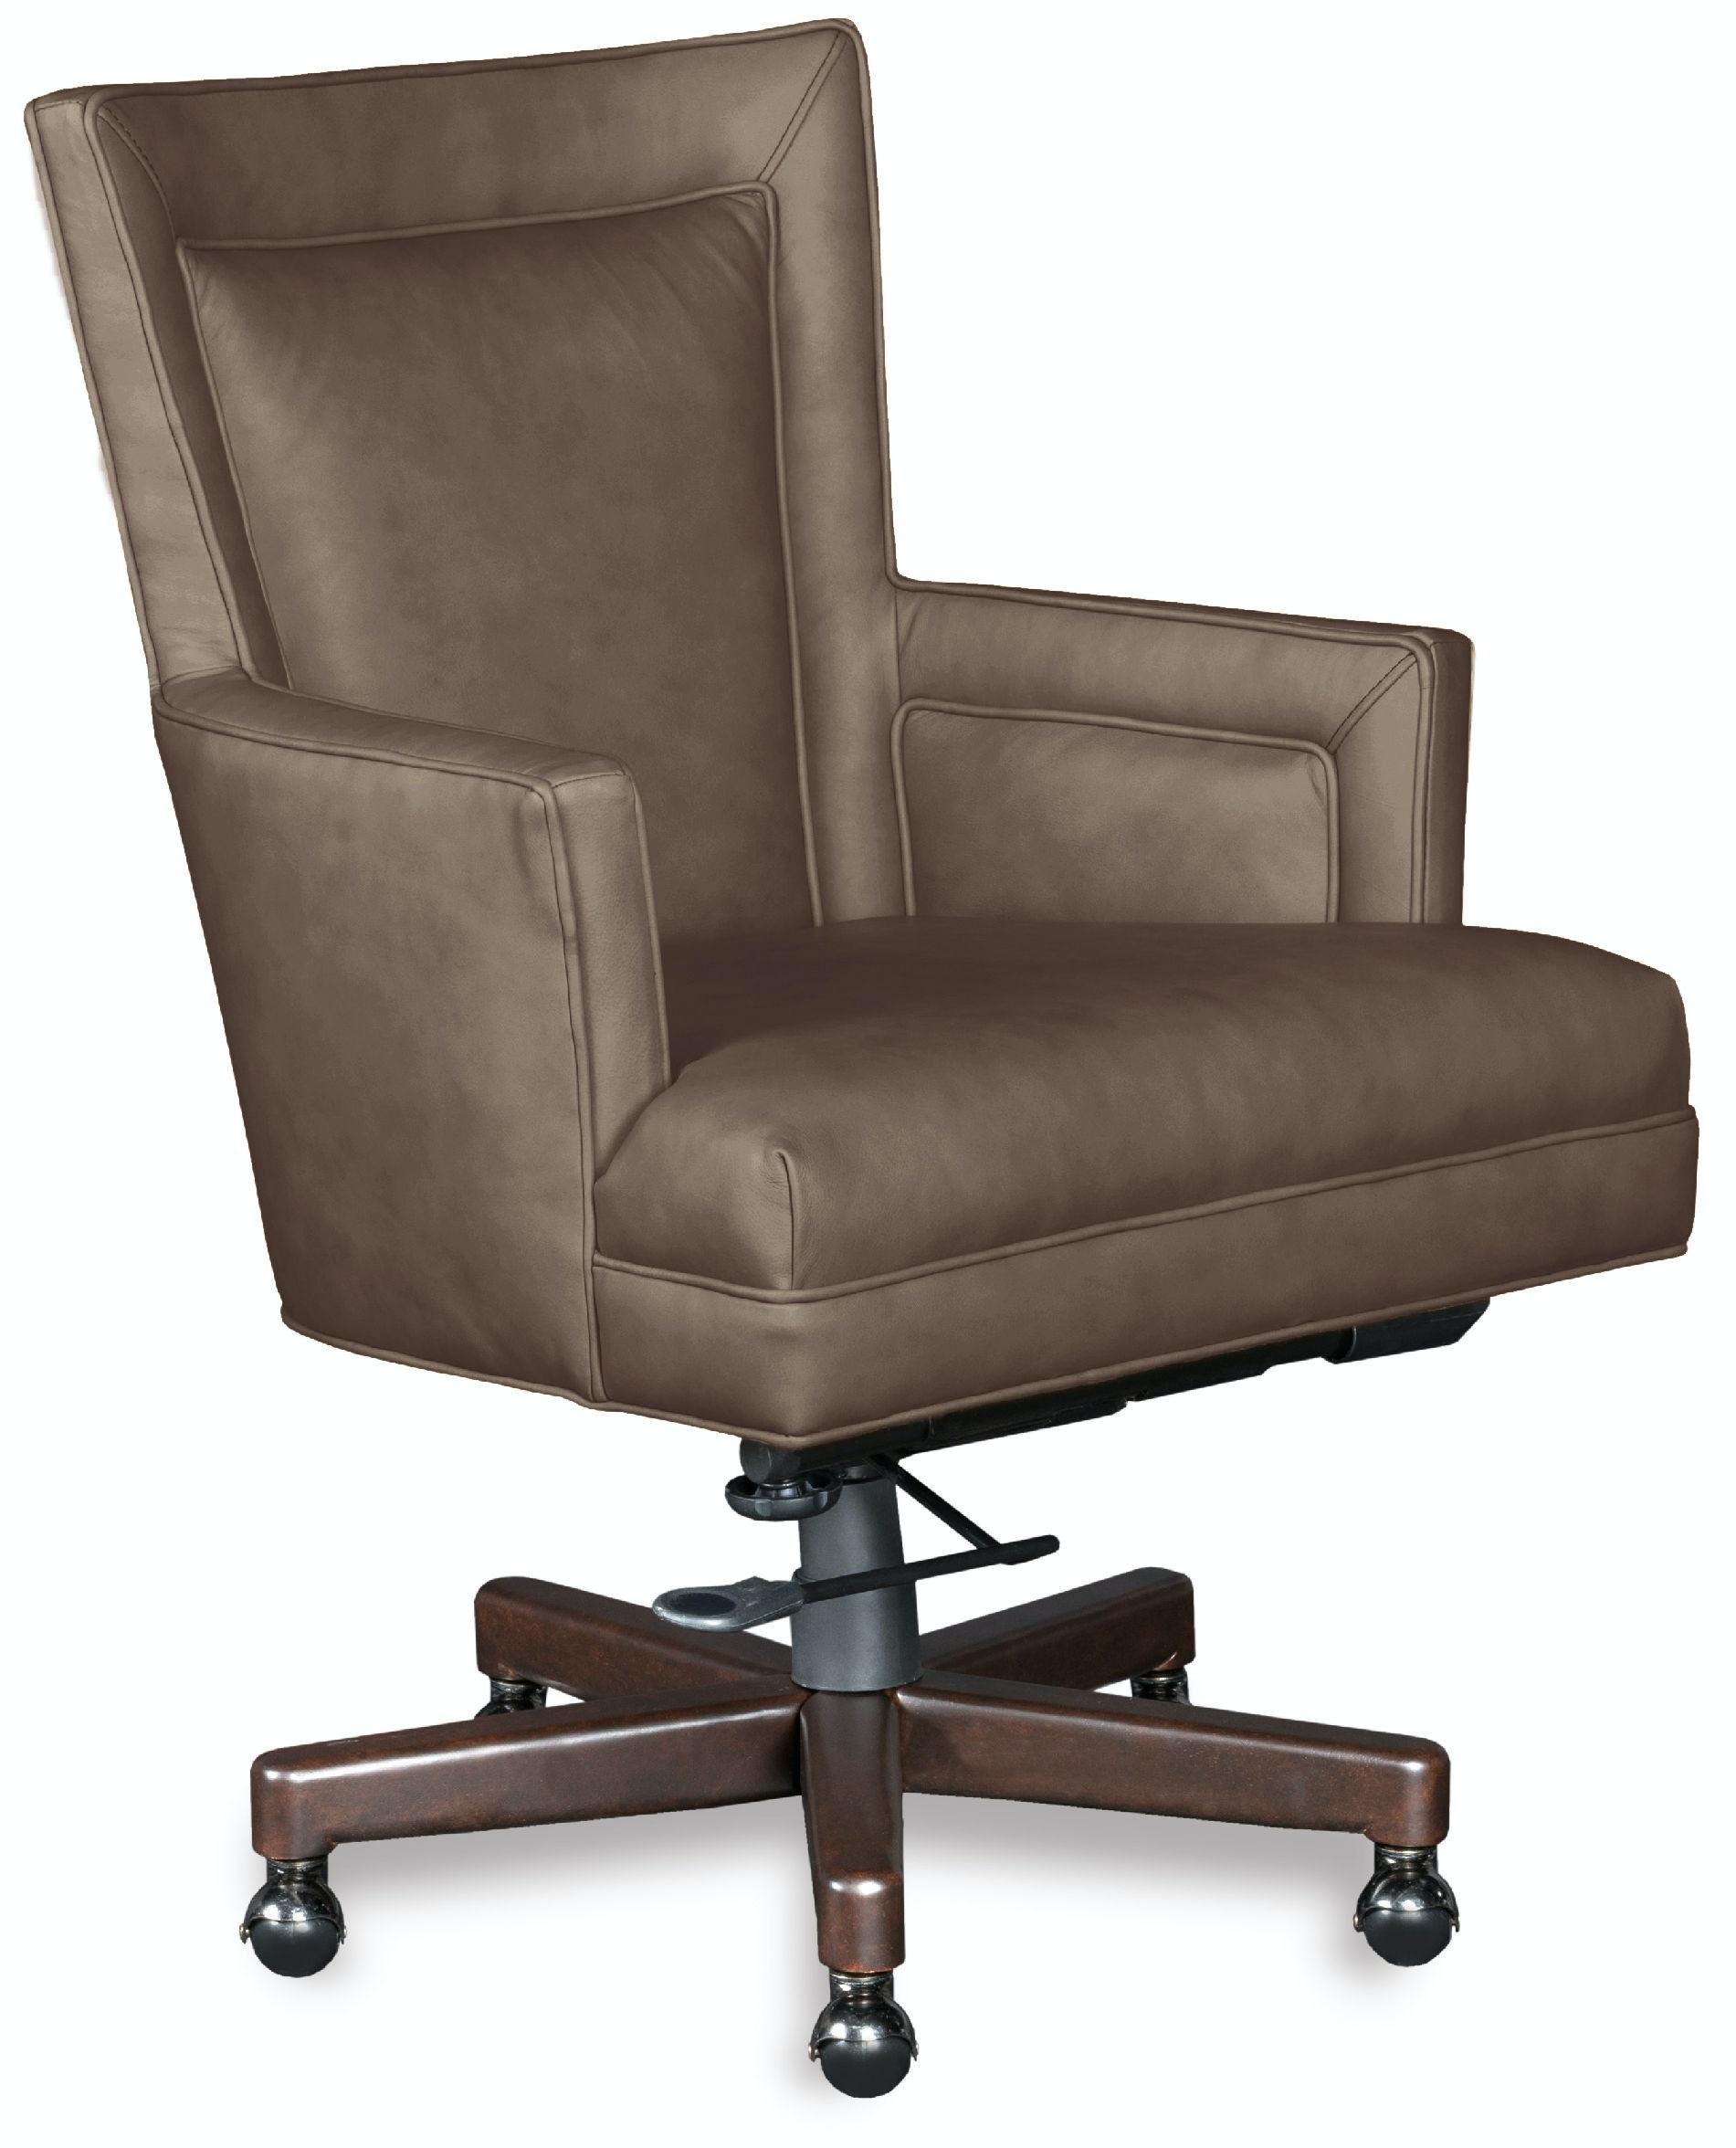 Charmant Hooker Furniture